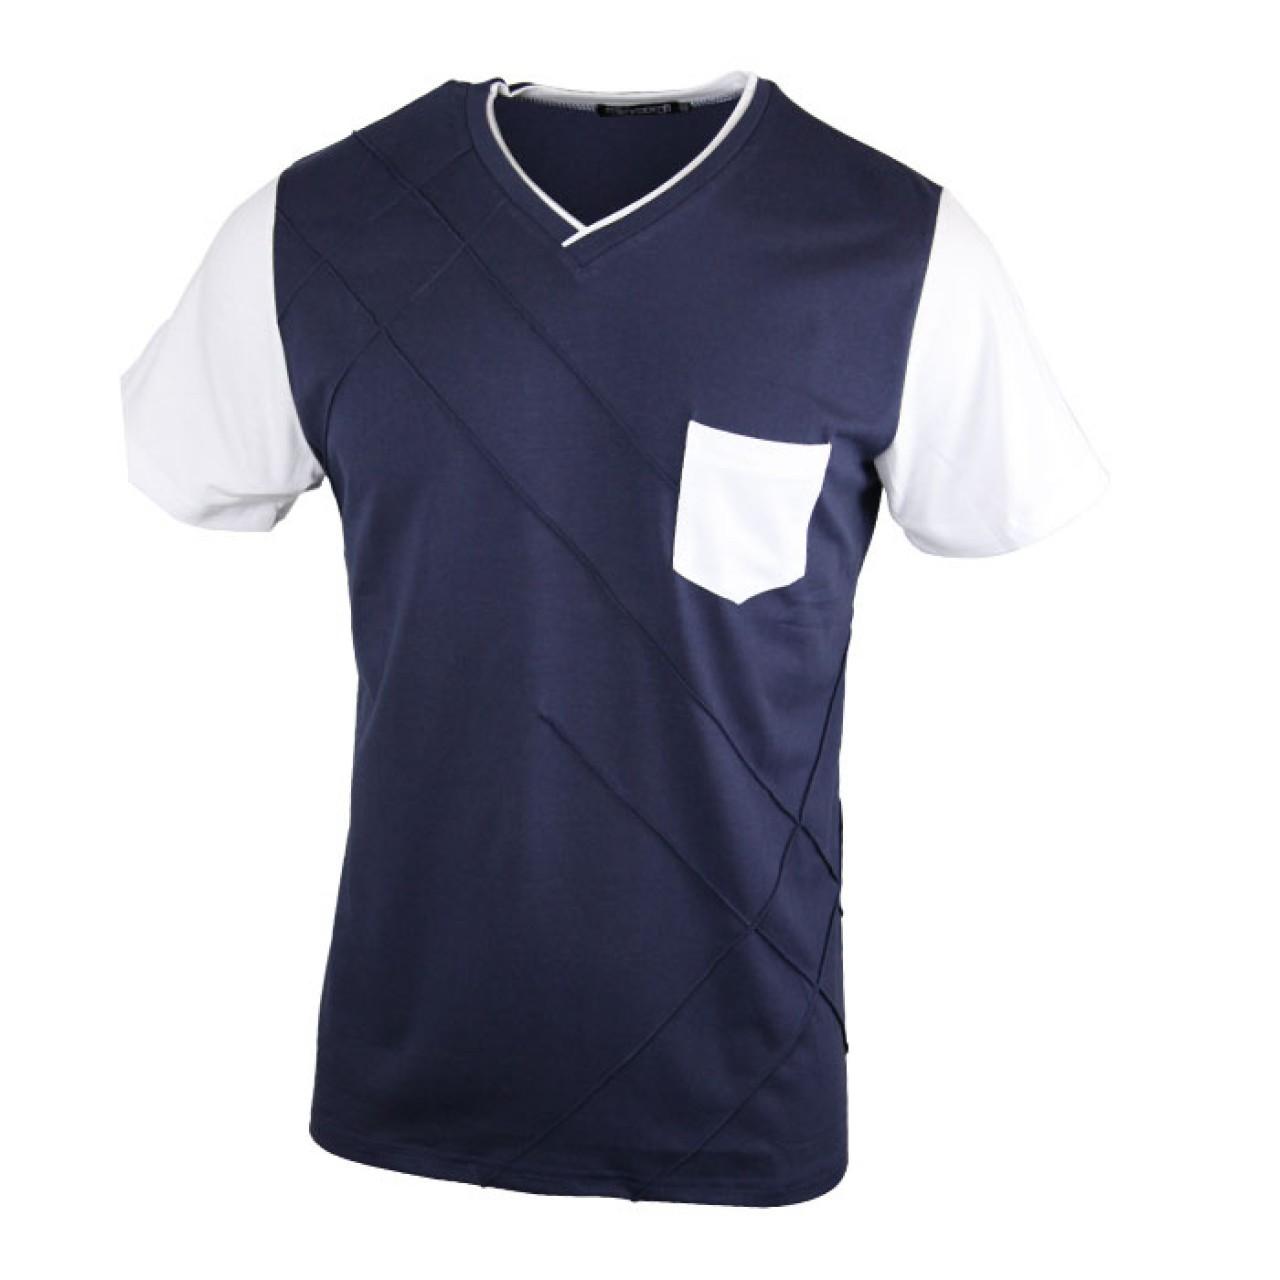 Men's Blue  V-neck Tee with Stripe Patten